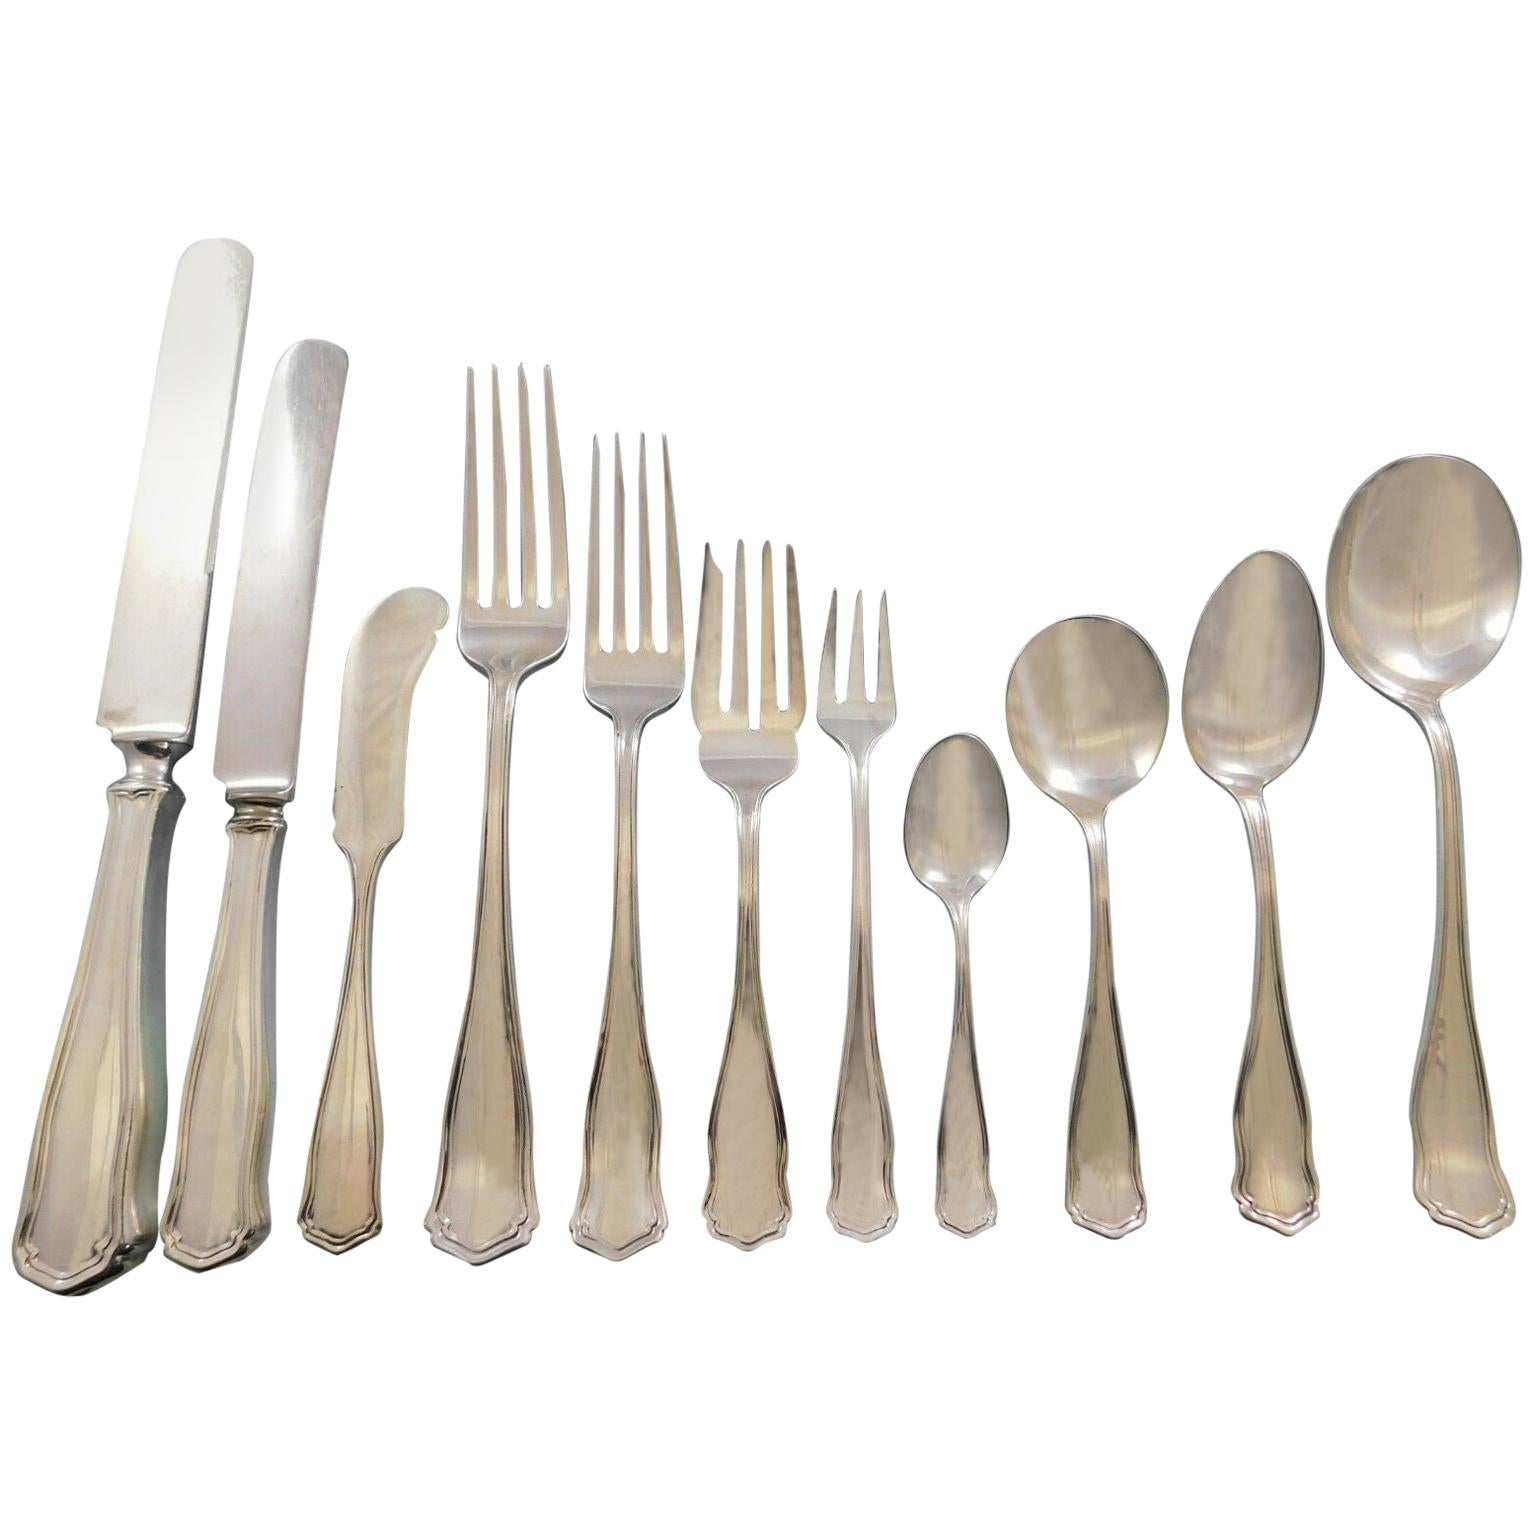 Winchester, Shreve Sterling Silver Flatware Set Service 149 Piece Dinner in Box